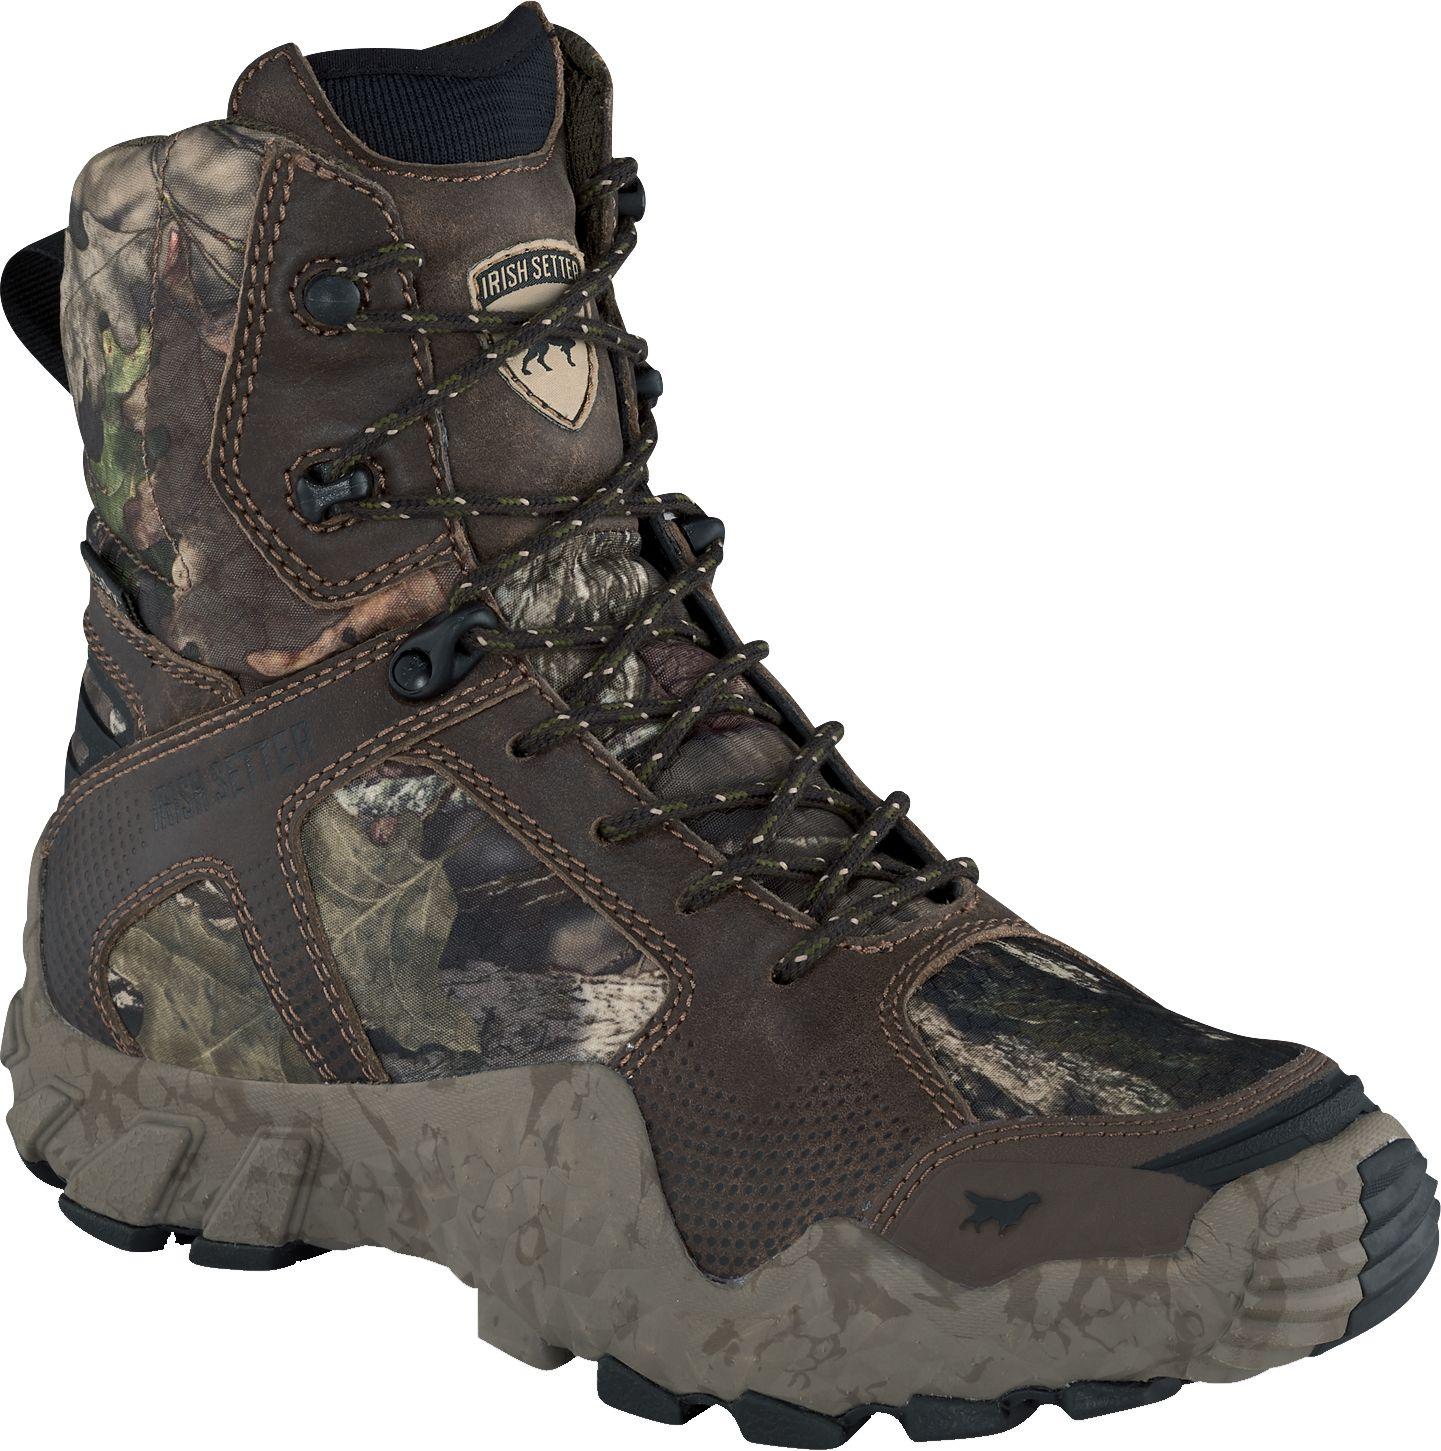 Irish Setter Women's VaprTrek 8'' Mossy Oak 400g Waterproof Hunting Boots, Size: 5.0, Brown thumbnail